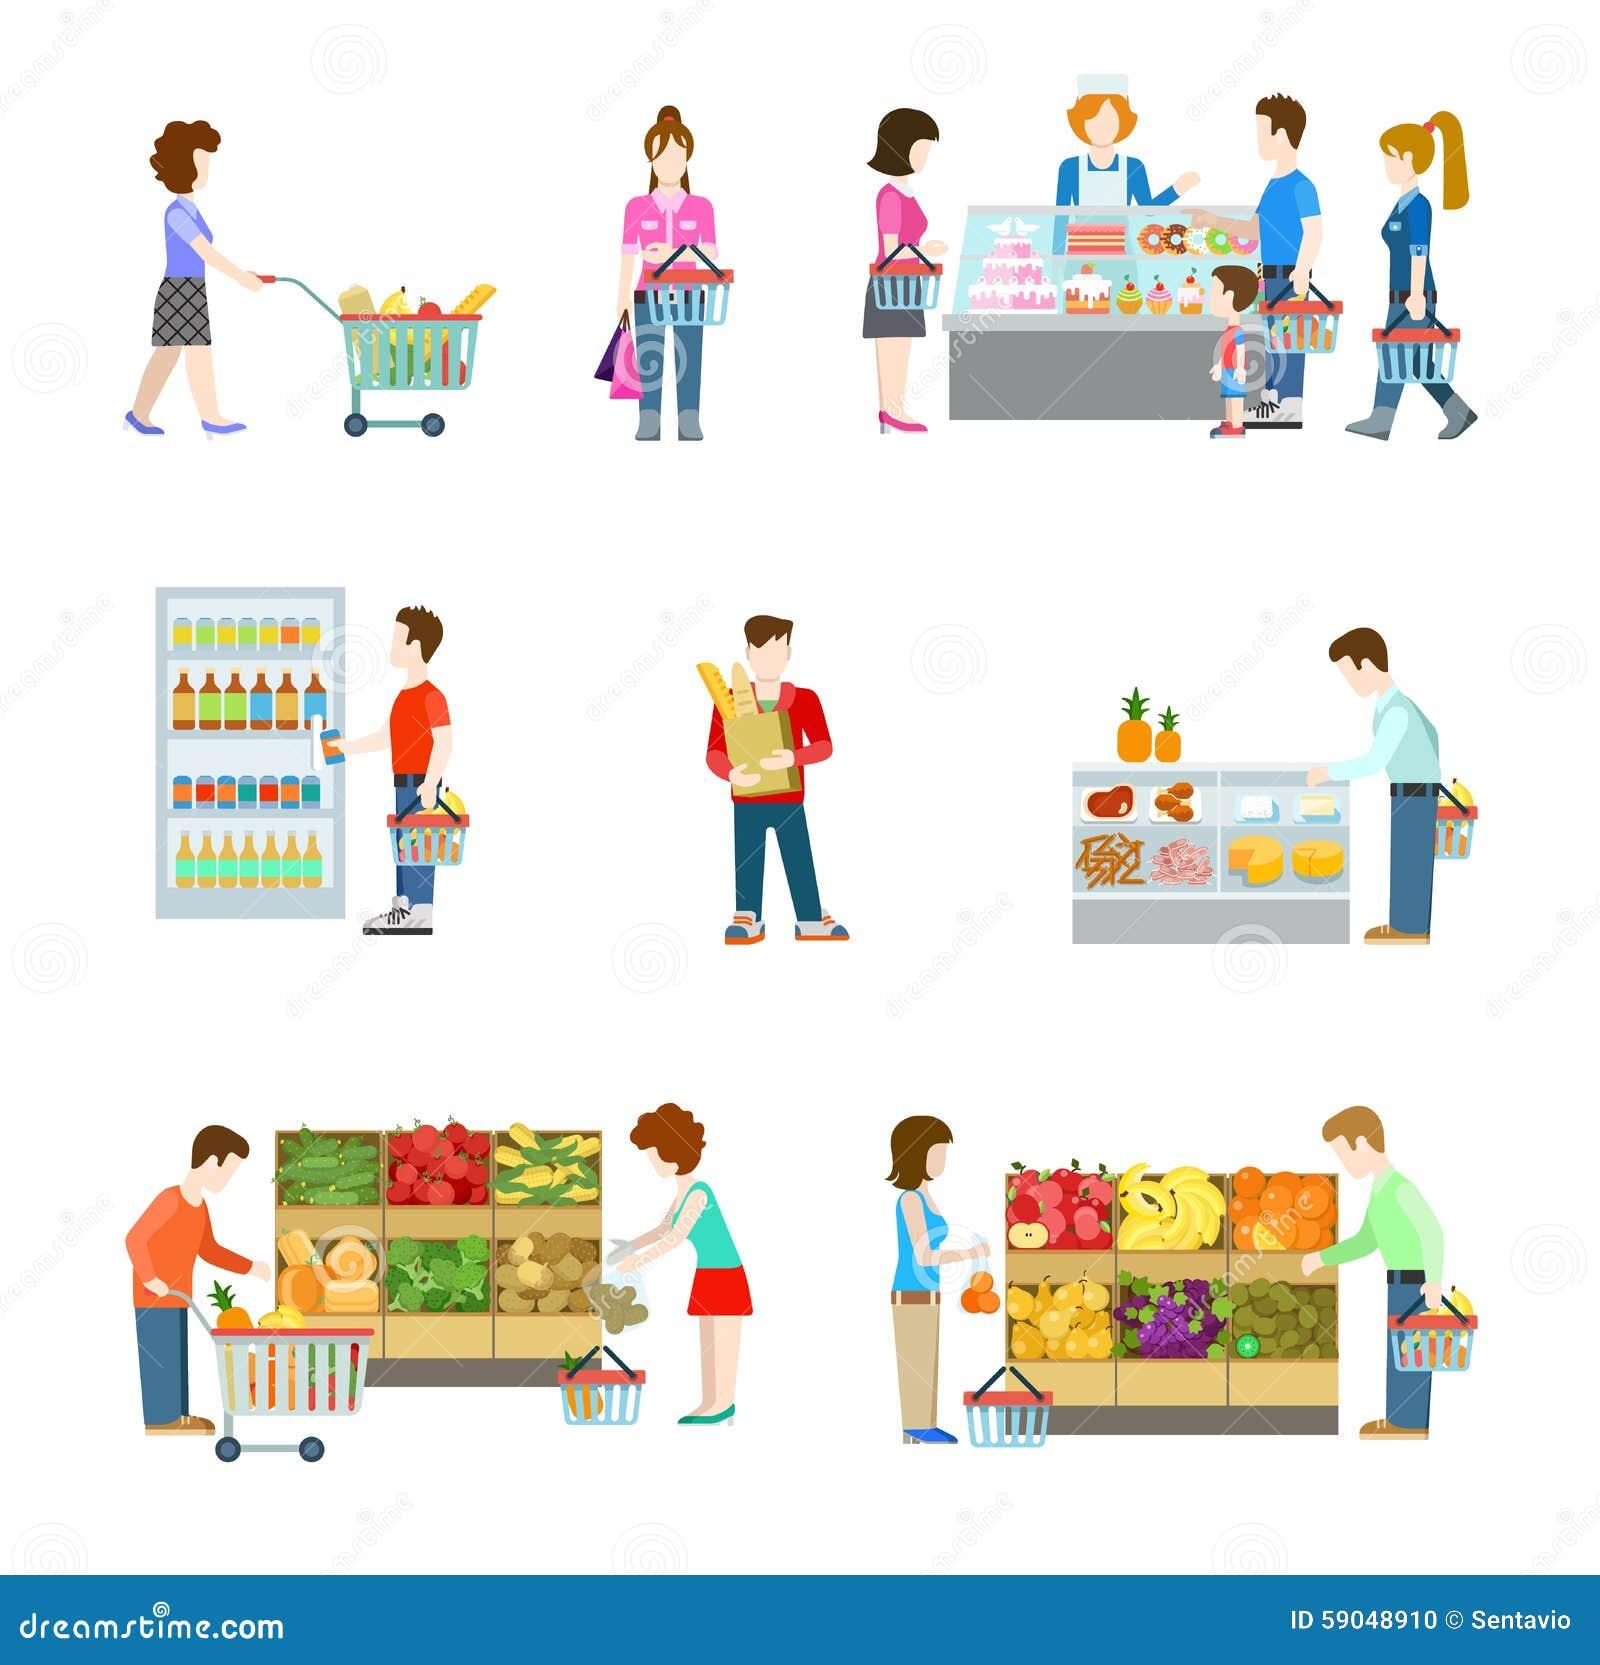 Grocery Supermarket Store Shoppers Buyers Vegetable Fruit Stock Vector Illustration 59048910